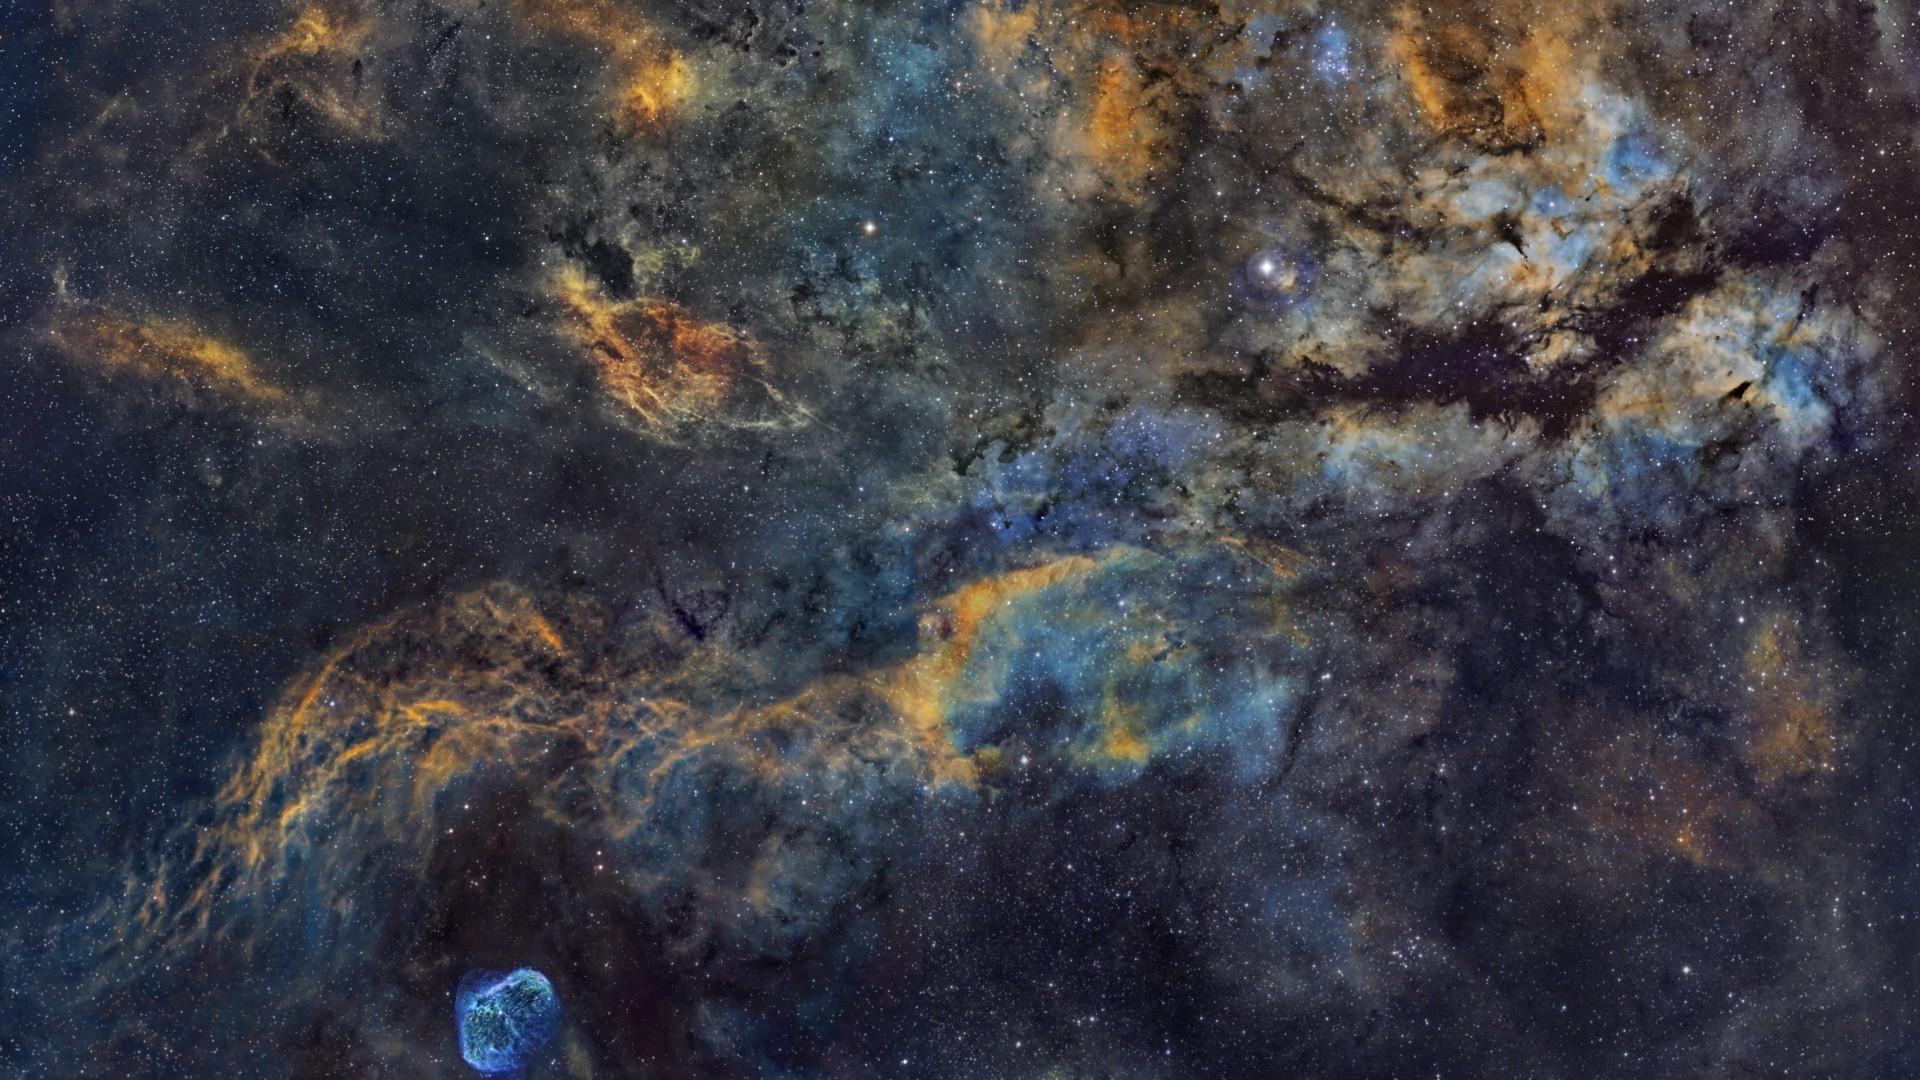 Fondos De Pantalla 1920x1080 Px Galaxia Nasa Nebulosa